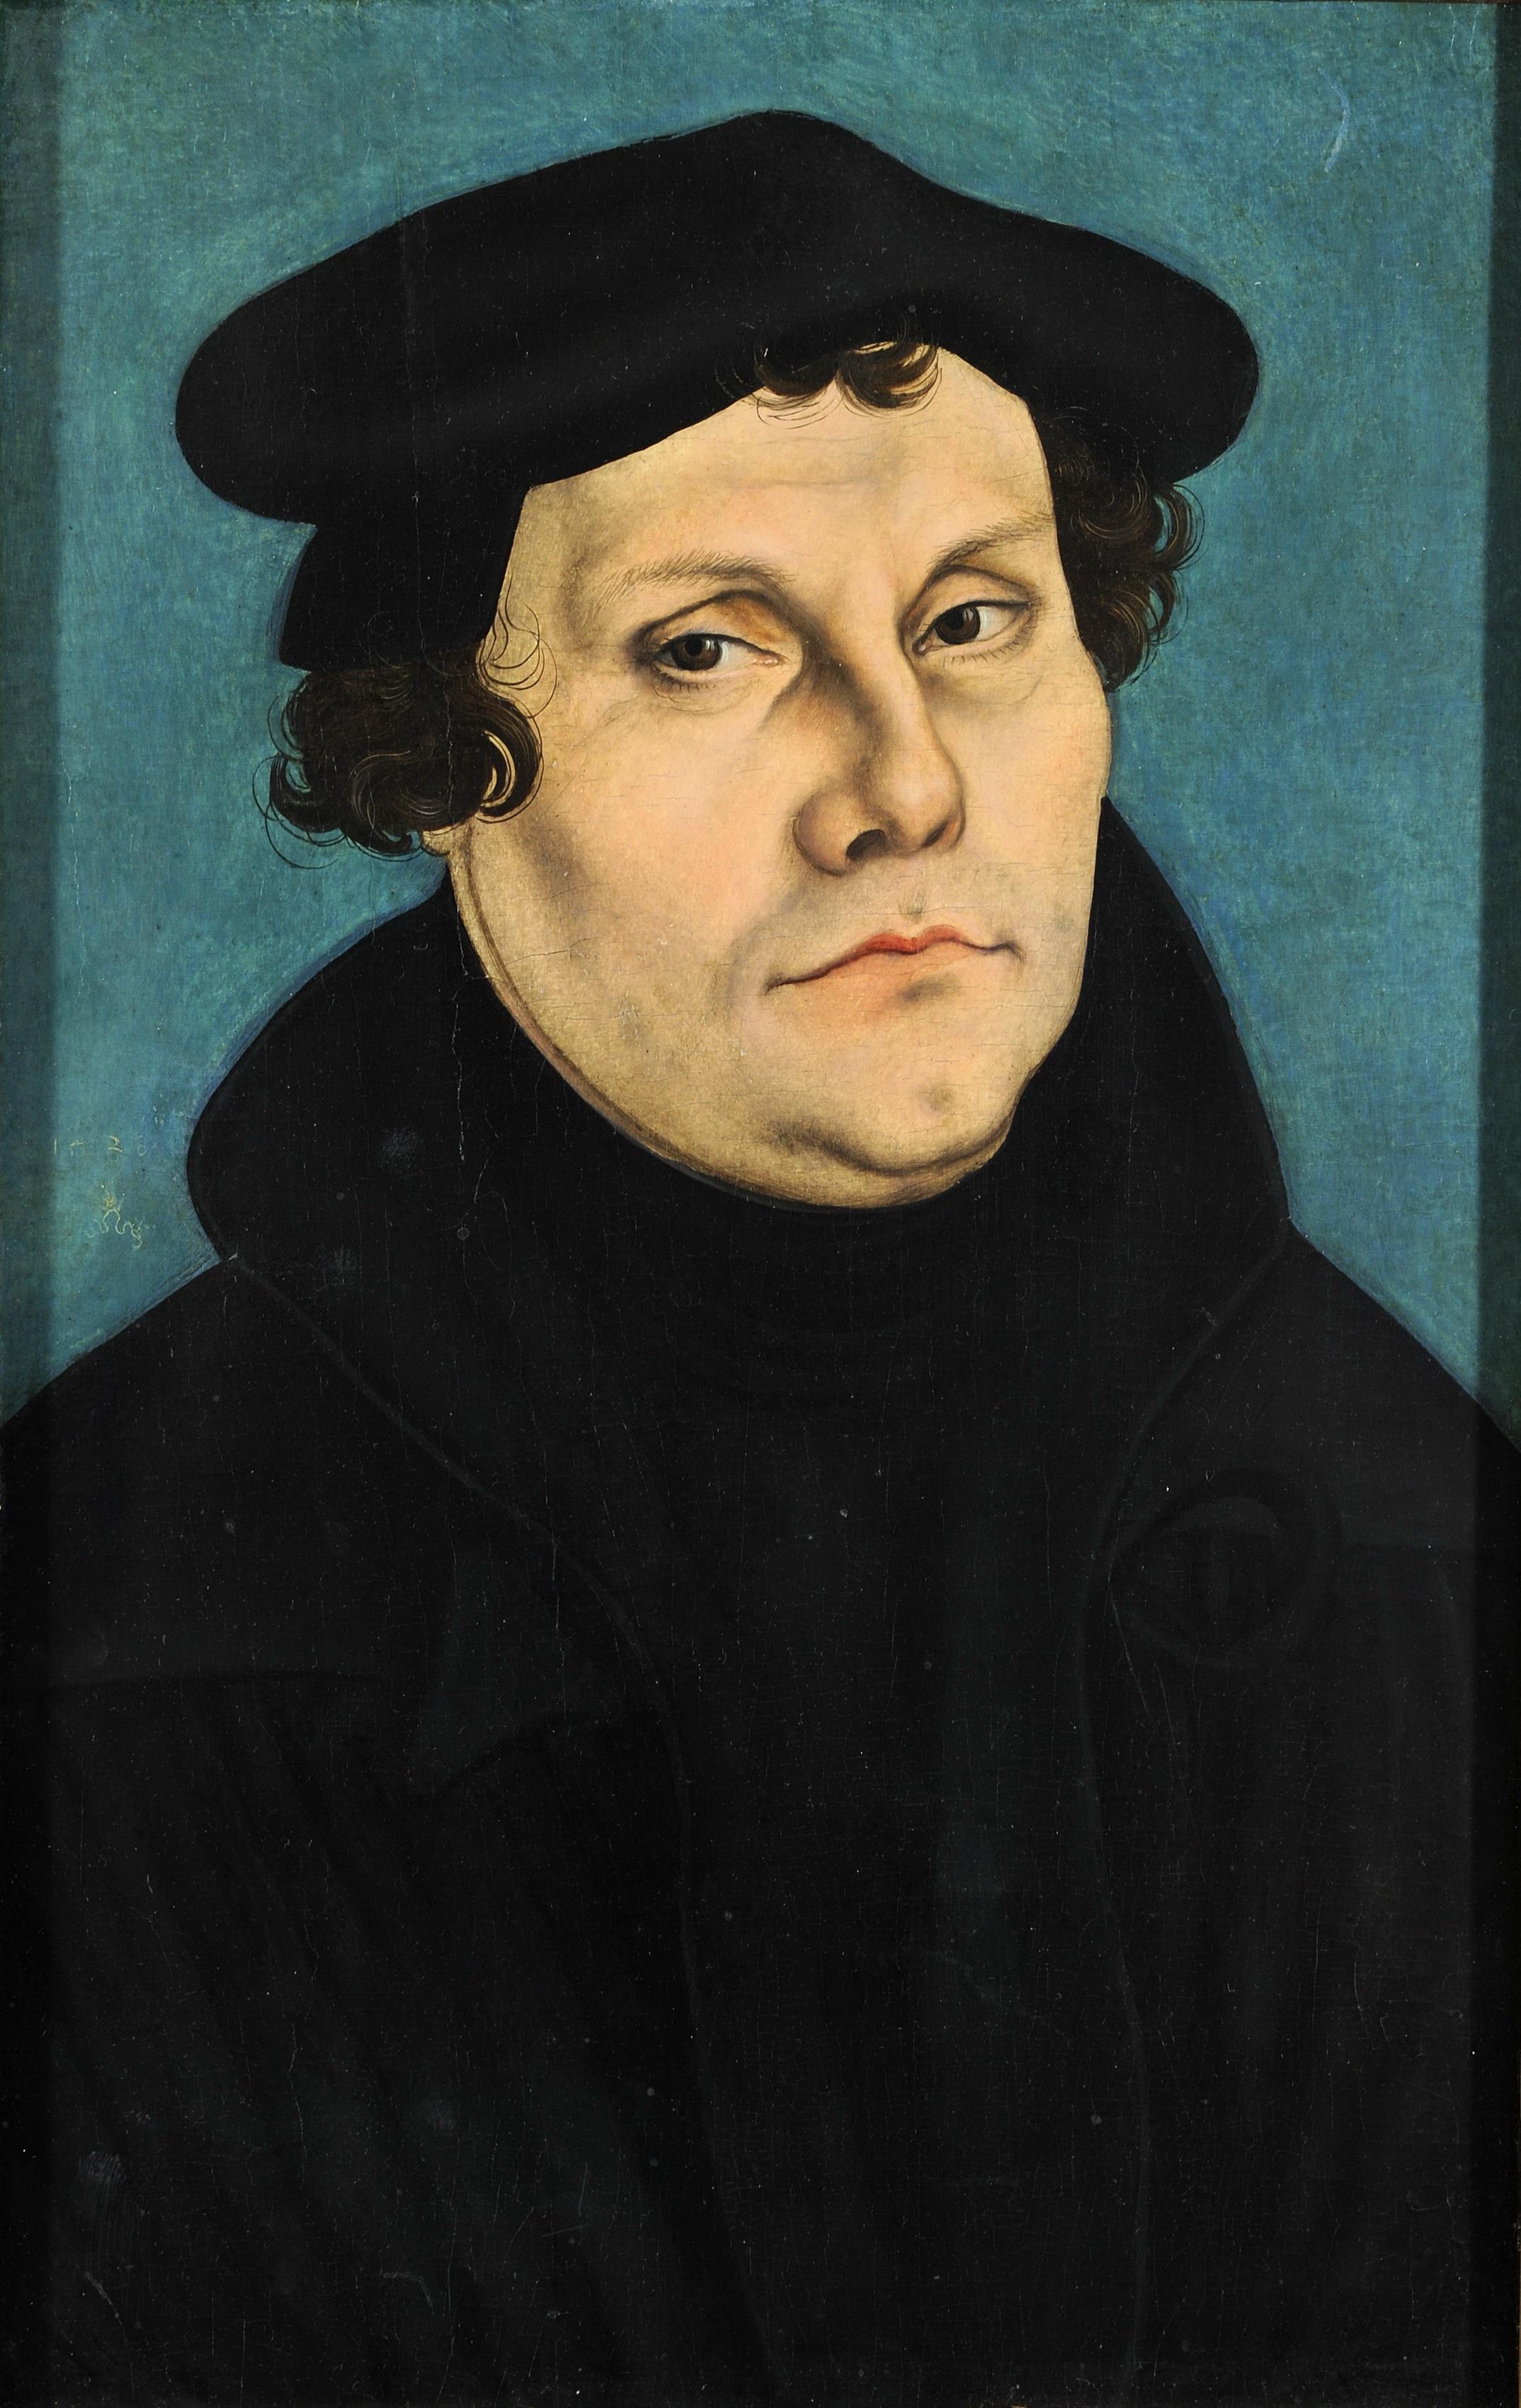 Мартин лютер и реформация реферат 4835